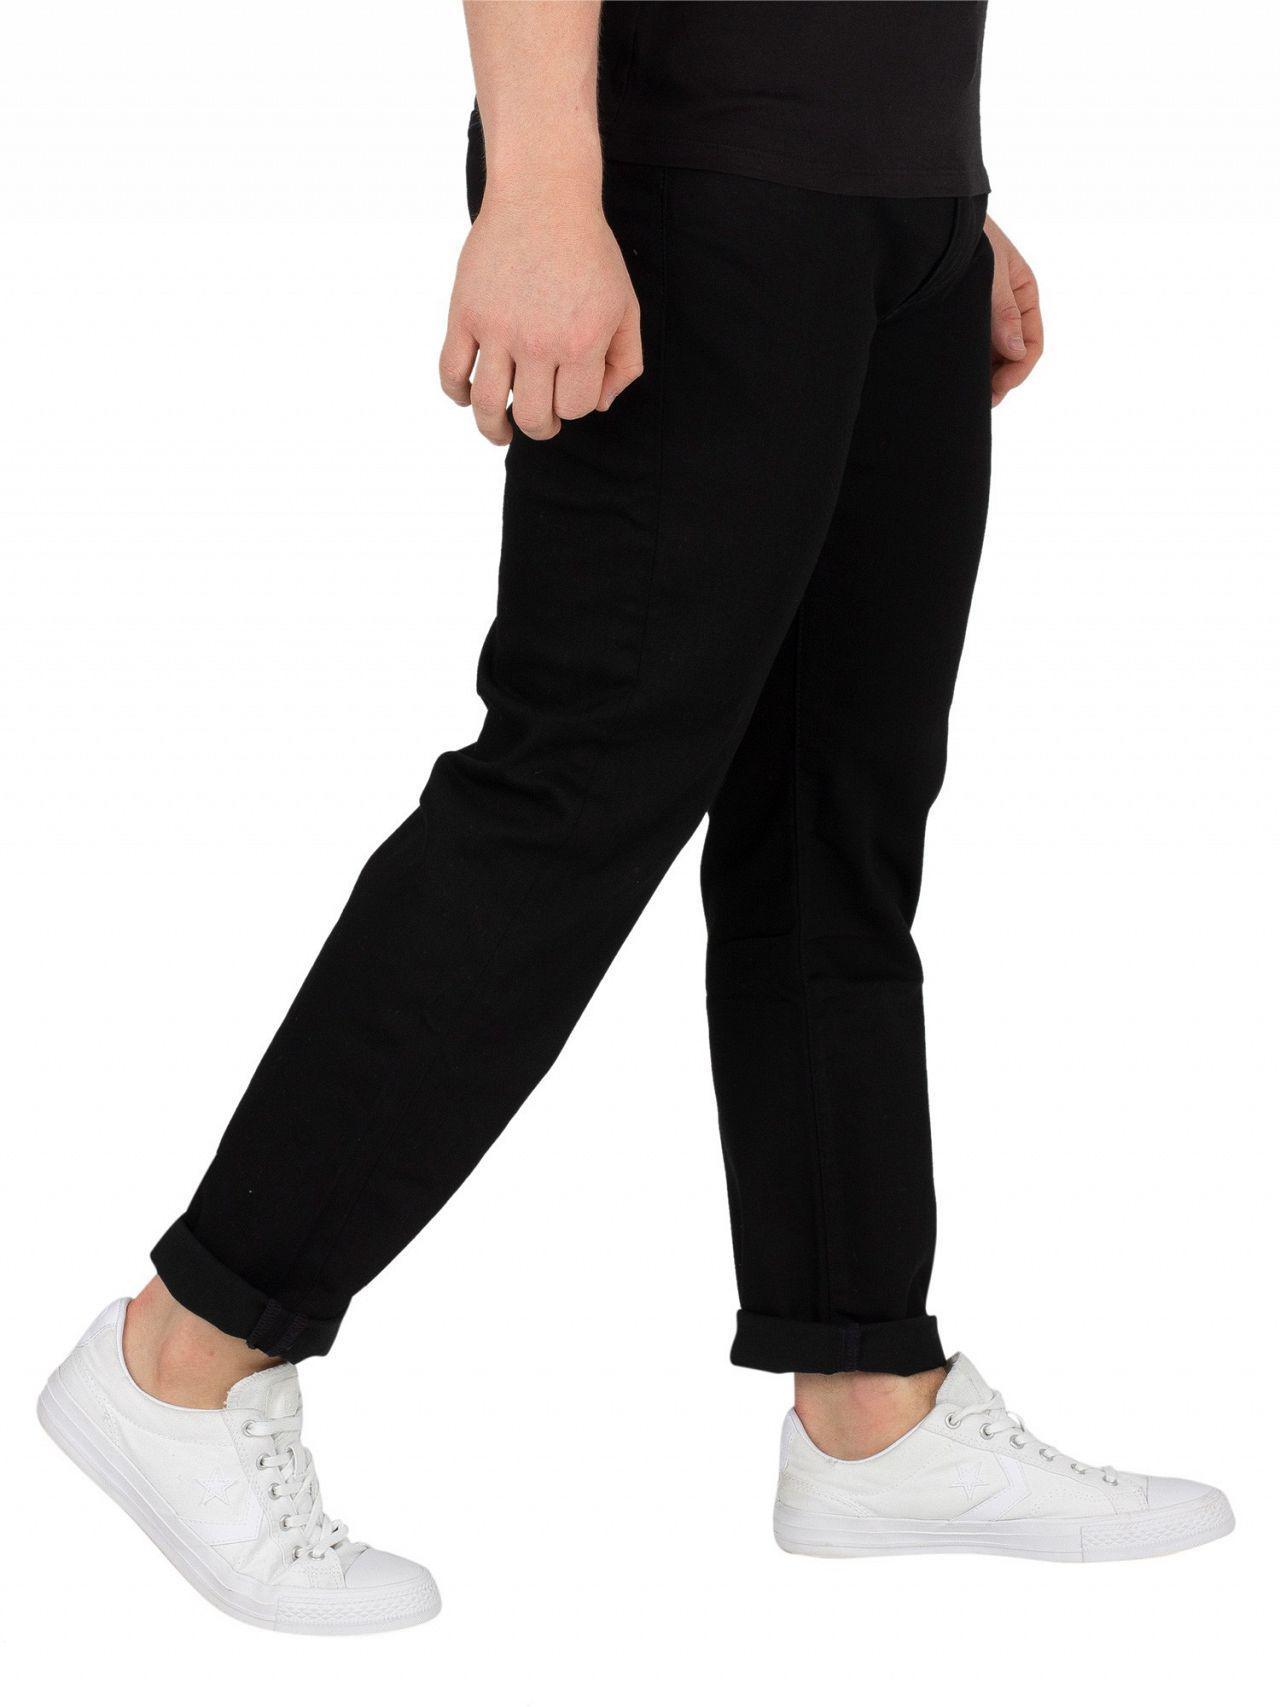 99fcdd38 Lyst - Levi's Nightshine 502 Regular Taper Jeans in Black for Men